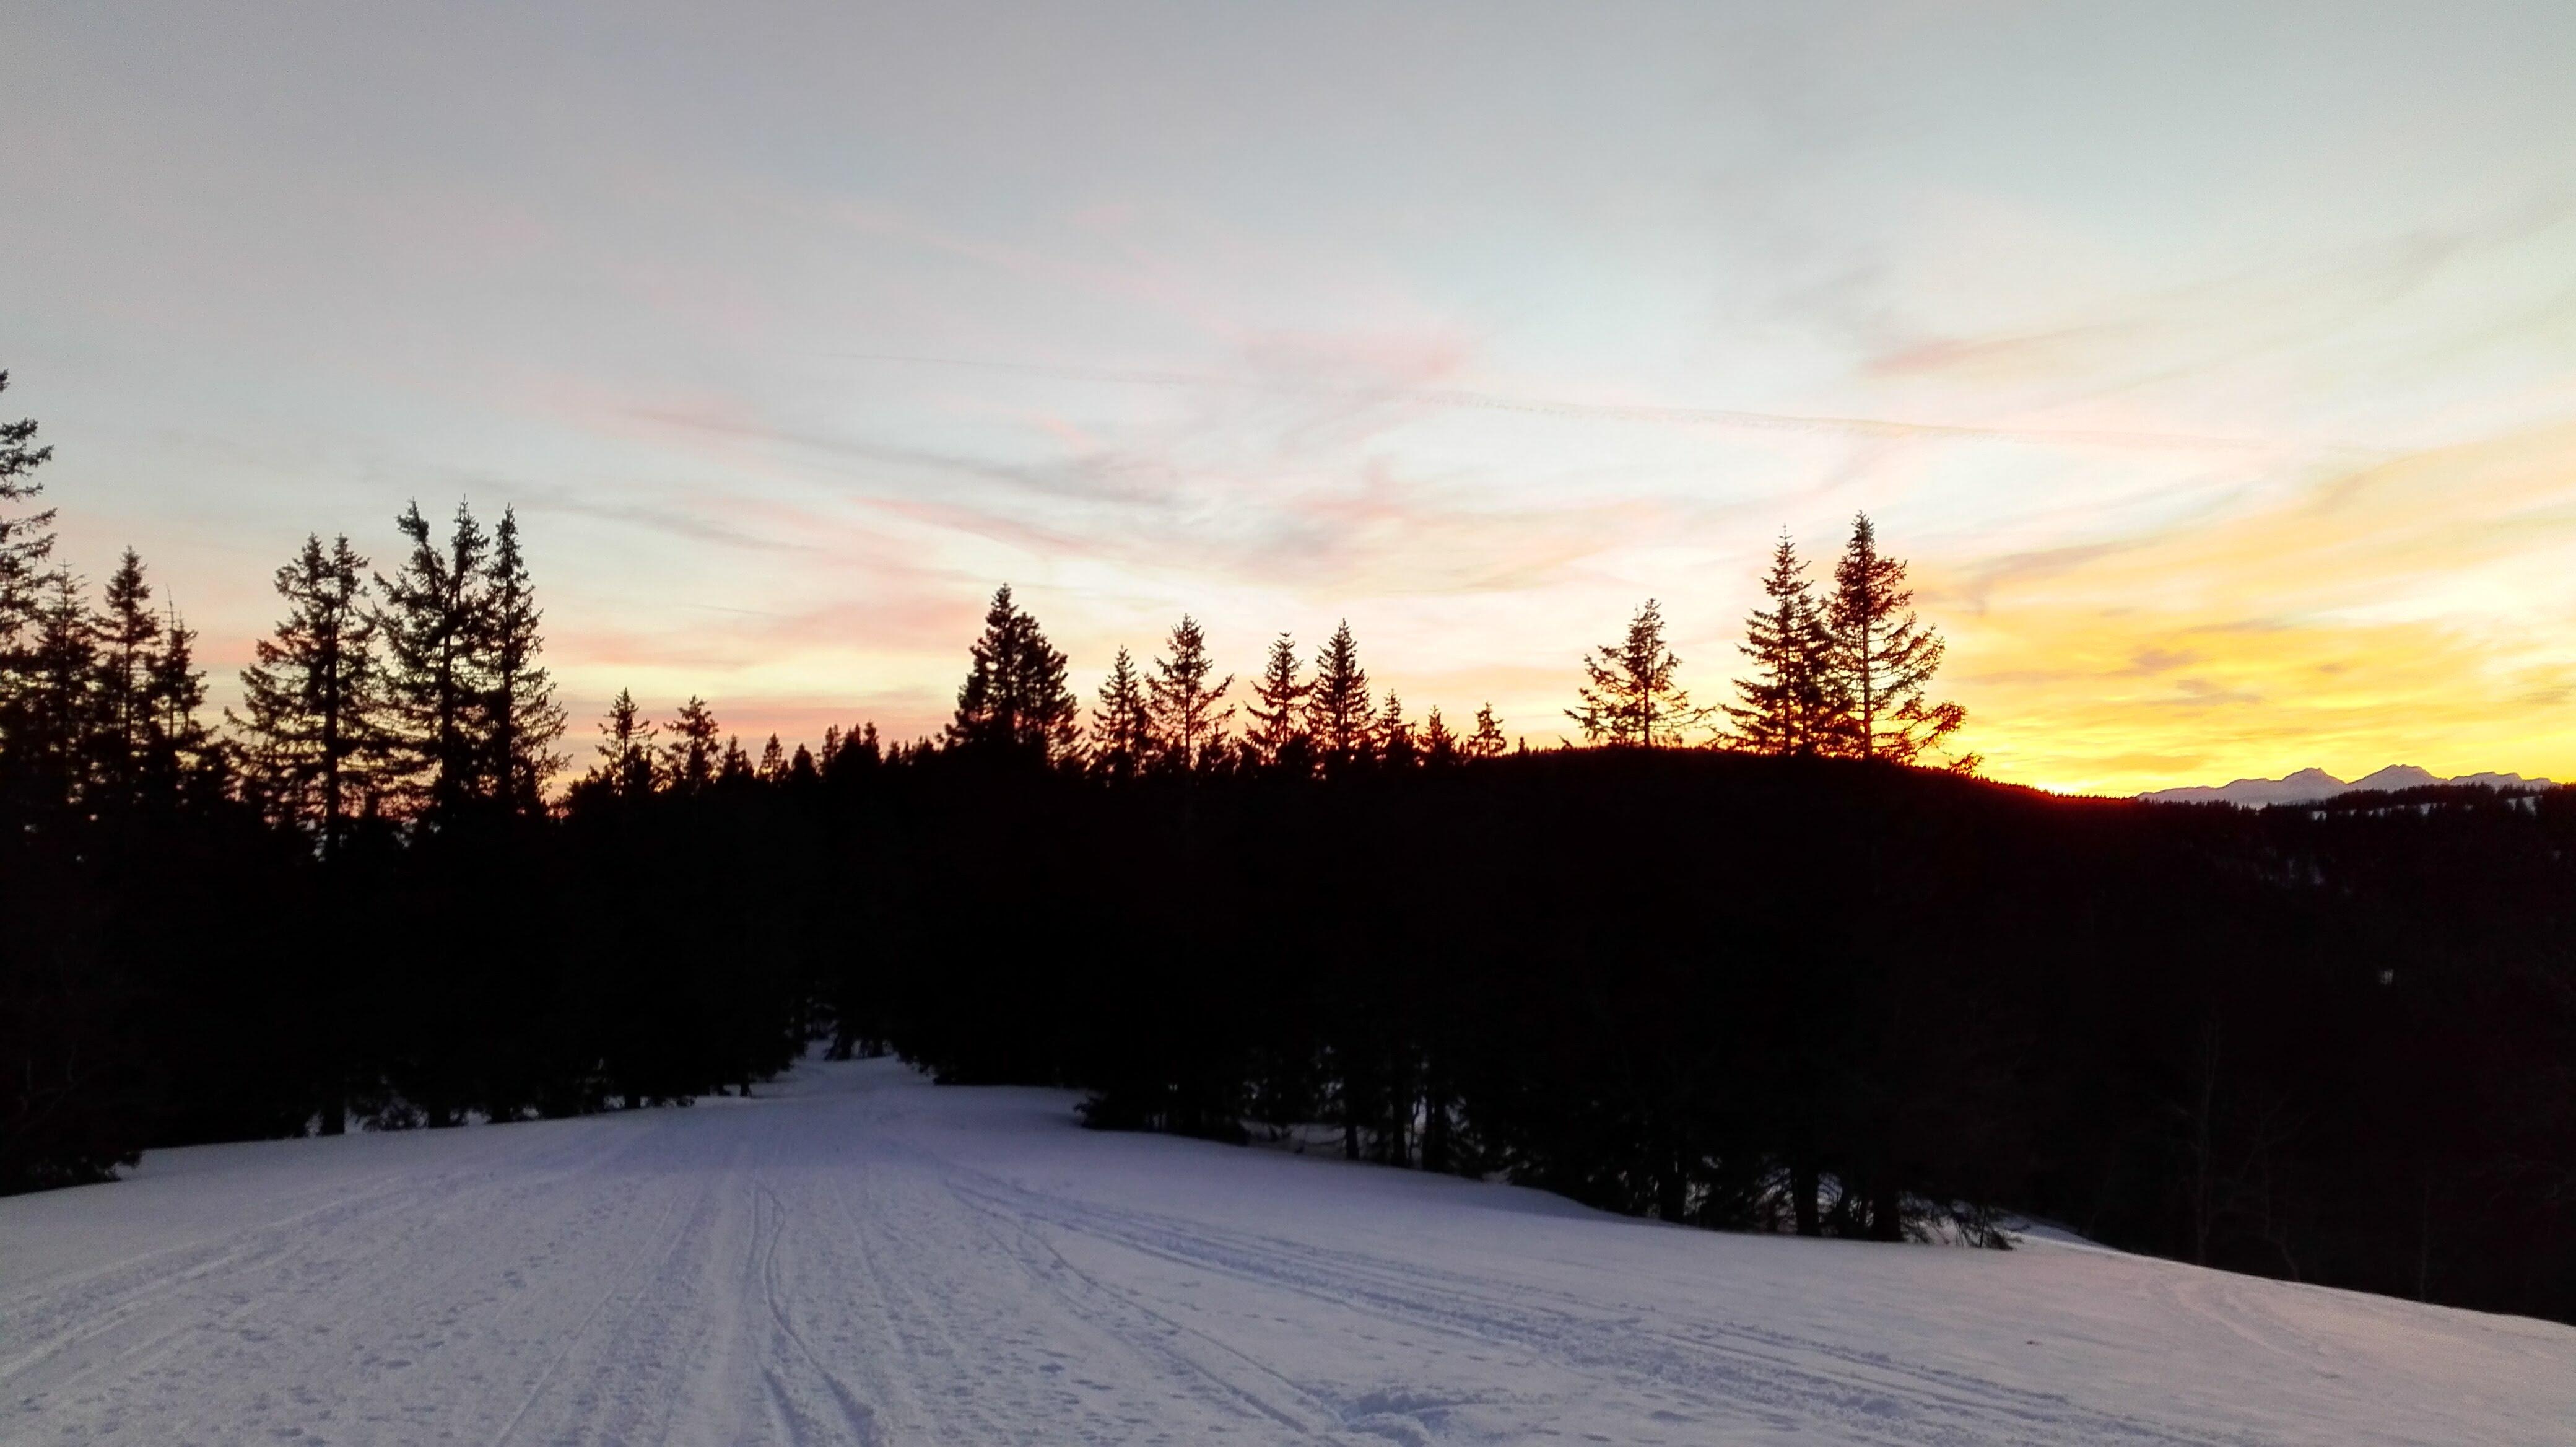 Hike Pohorje, Slovenia